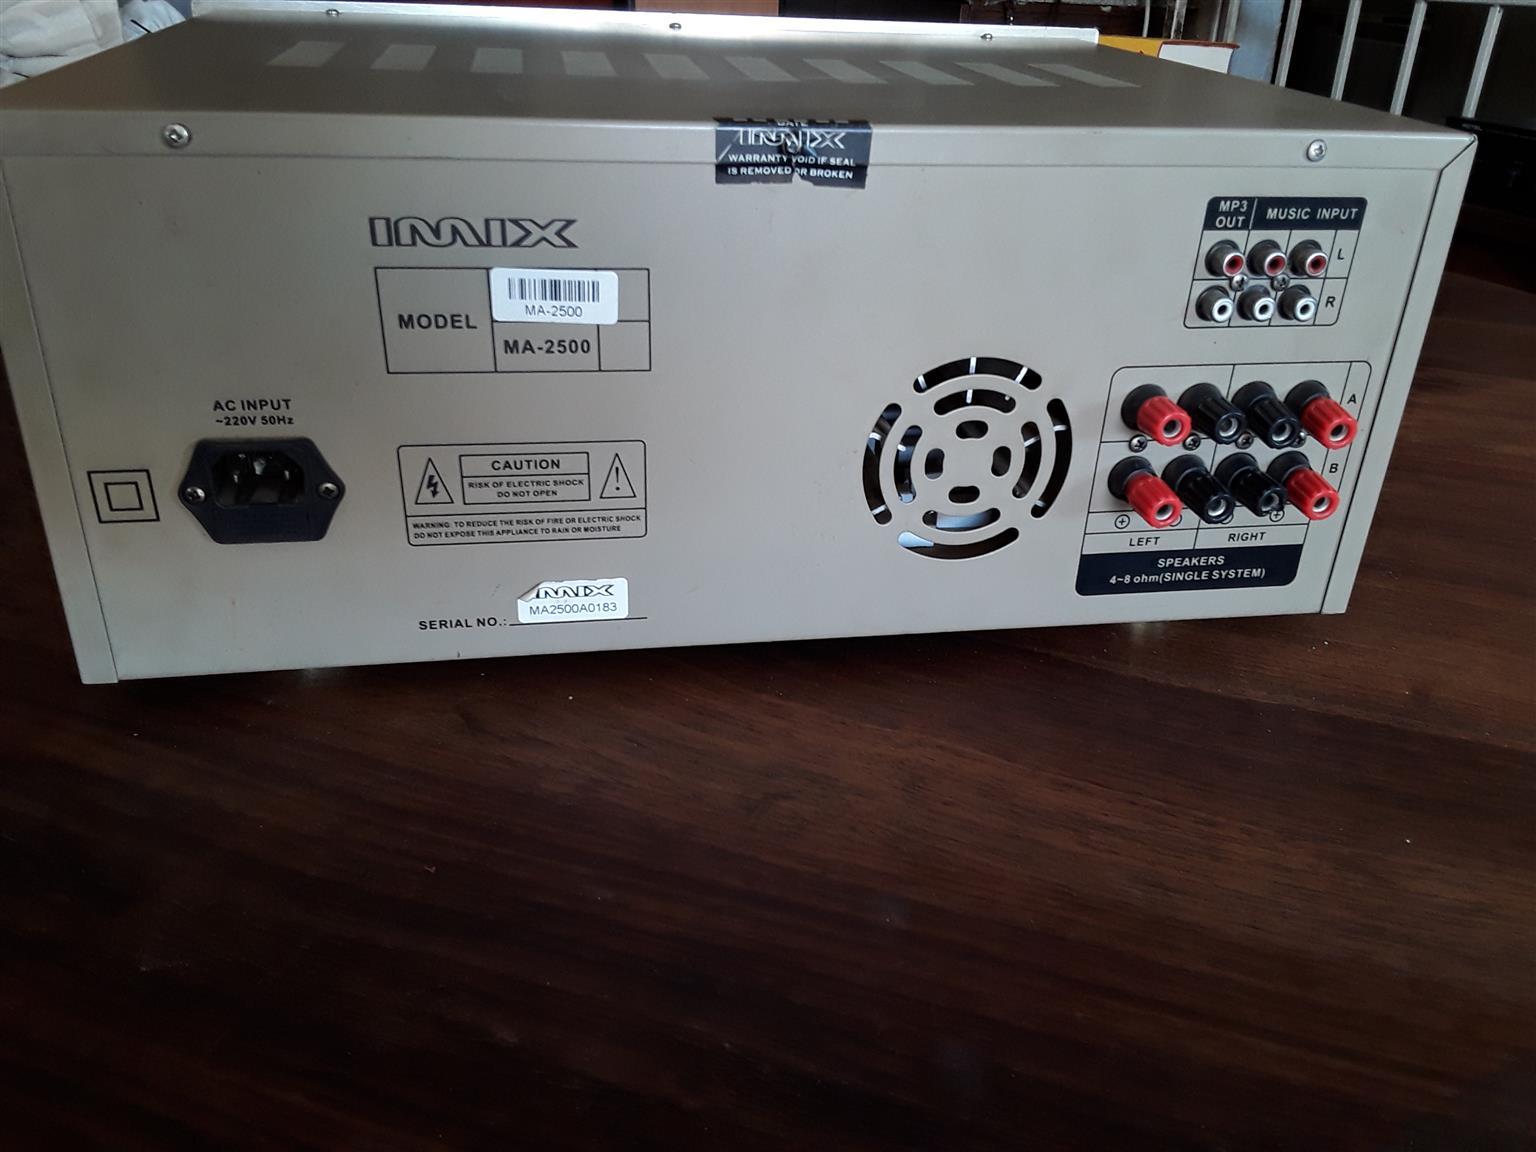 IMIX Professional Amplifier